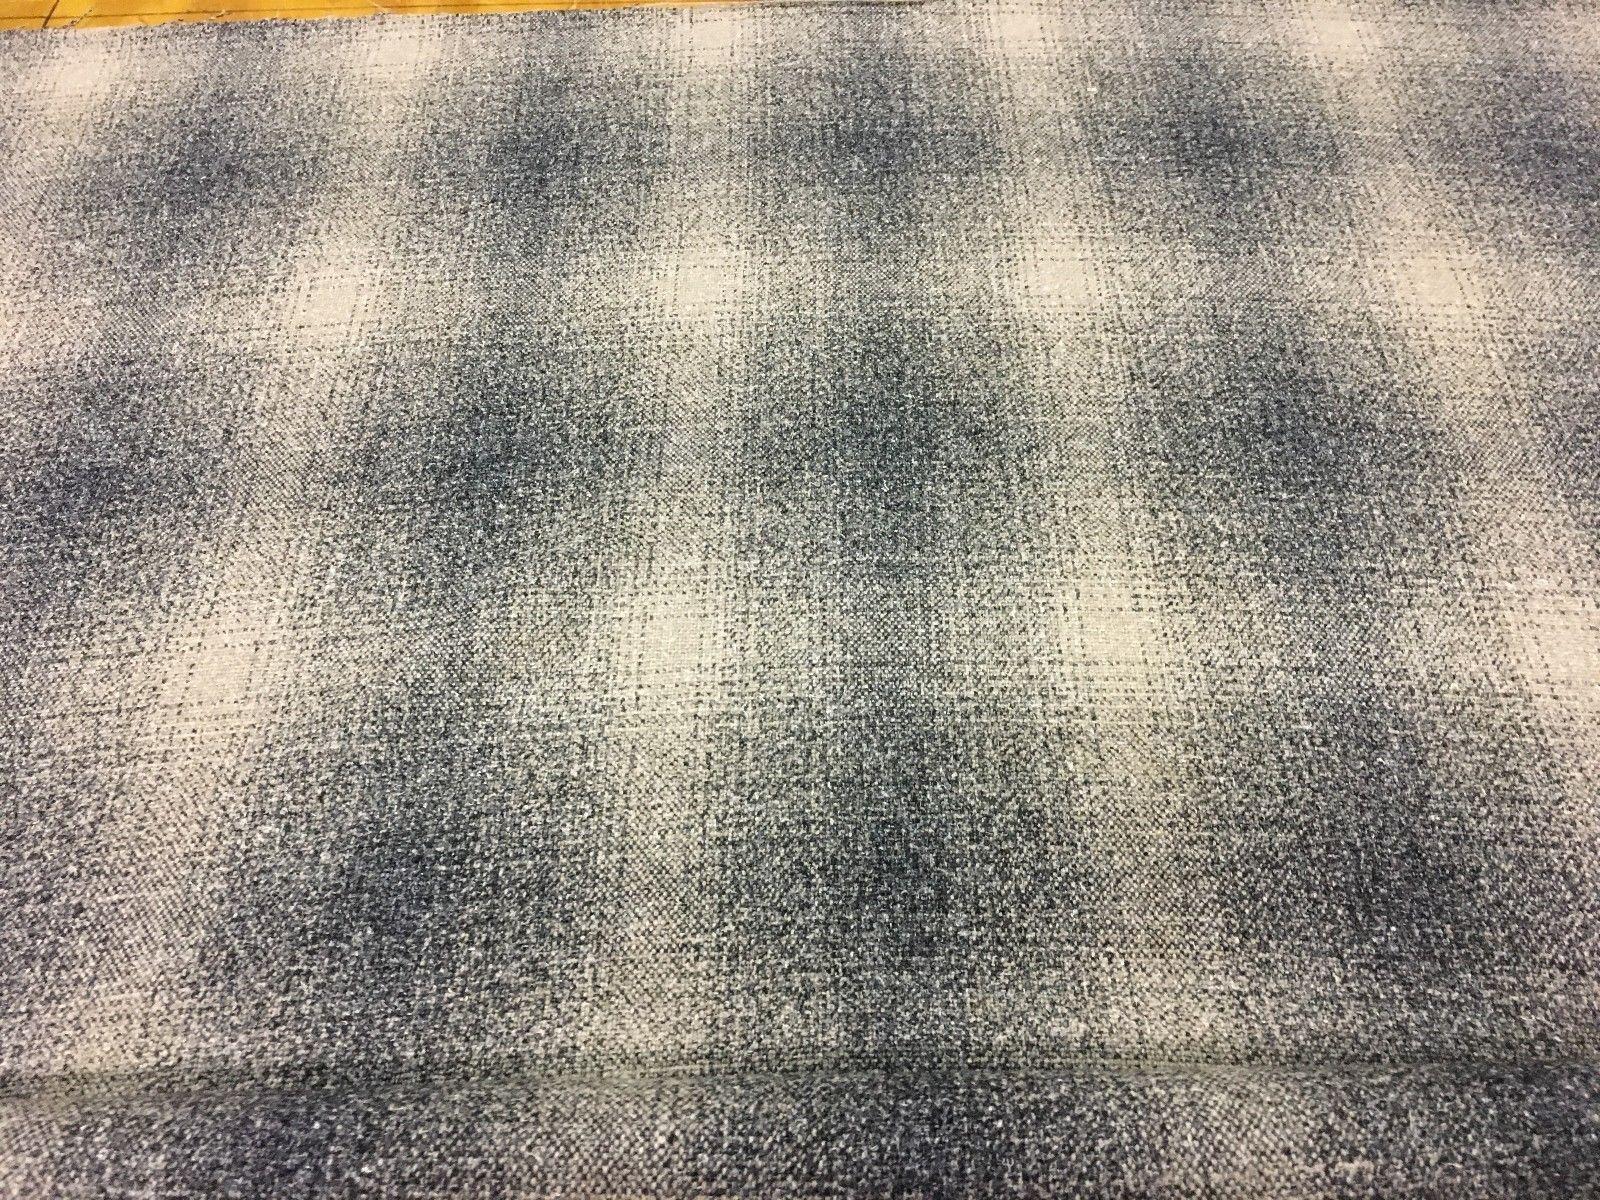 2.25 yds Camira Upholstery Fabric Hebden Hemp Wool Hexby Beige HWC02 BC